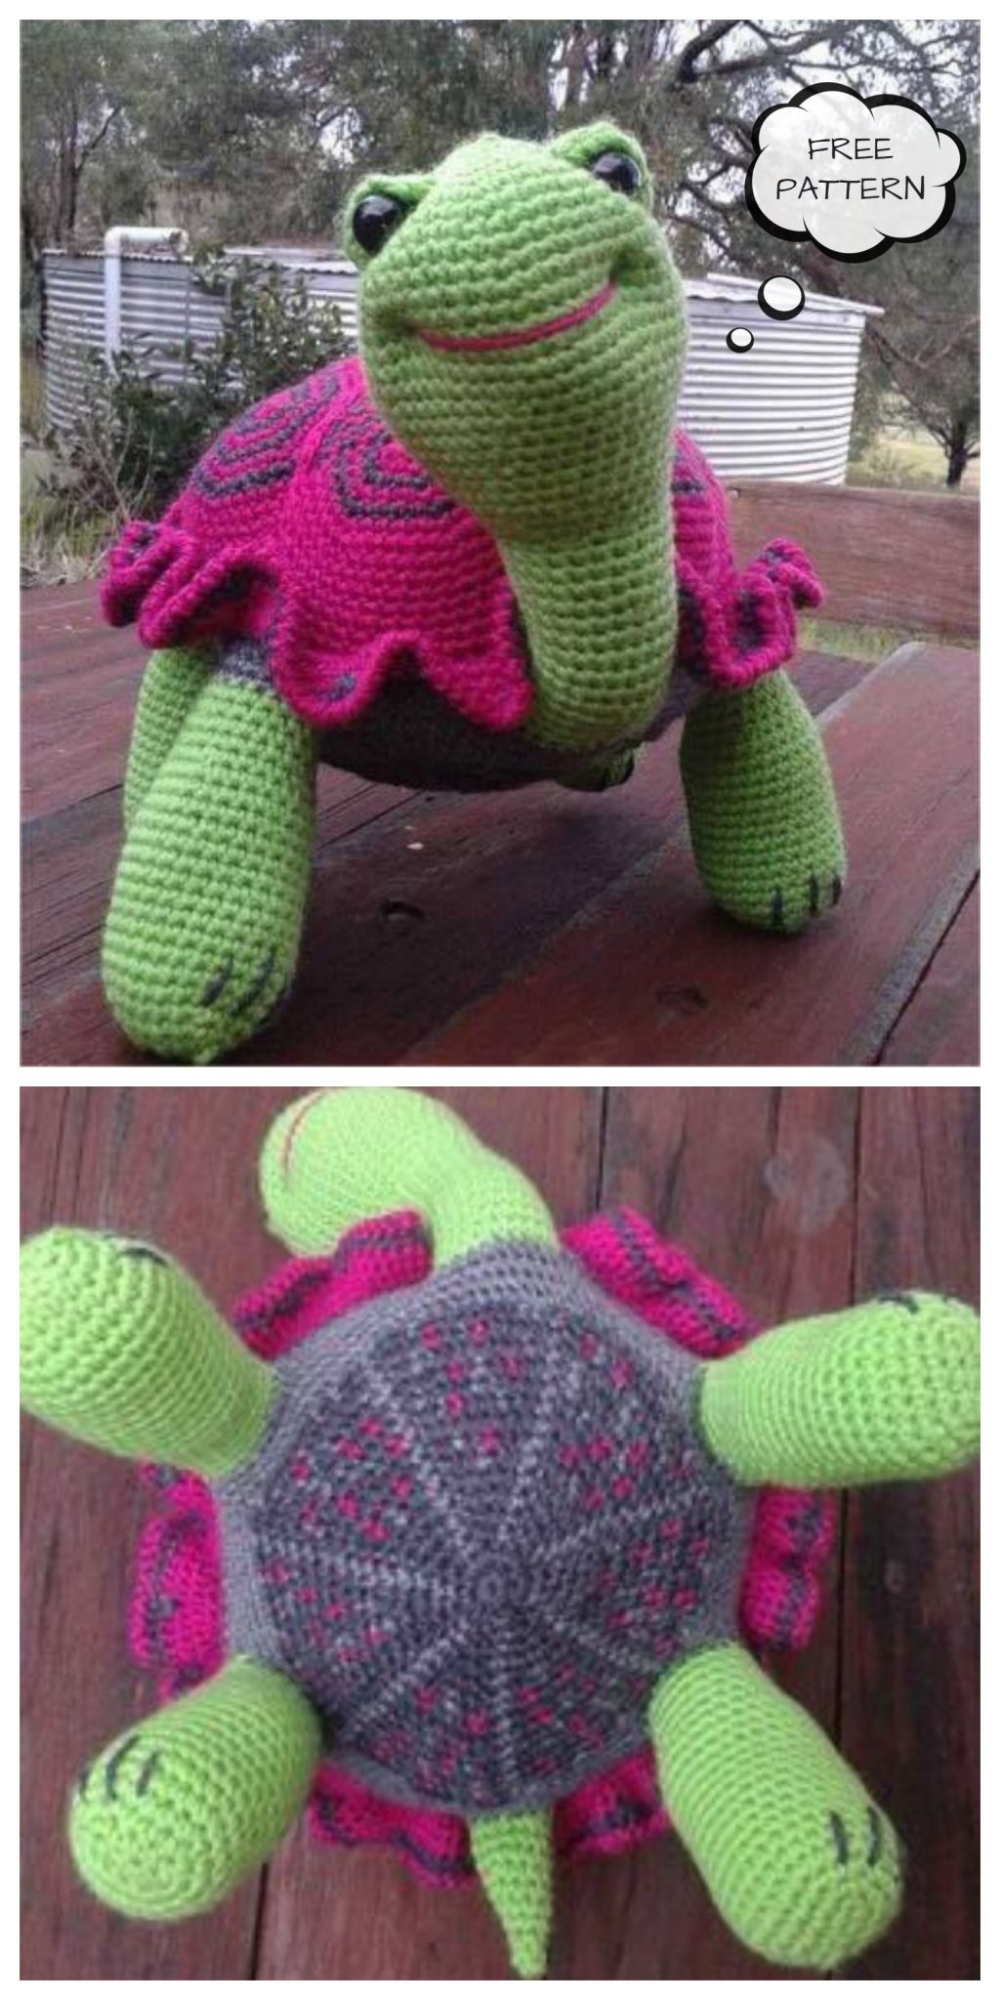 Crochet Toy Tortoise Amigurumi Free Patterns - DIY Magazine